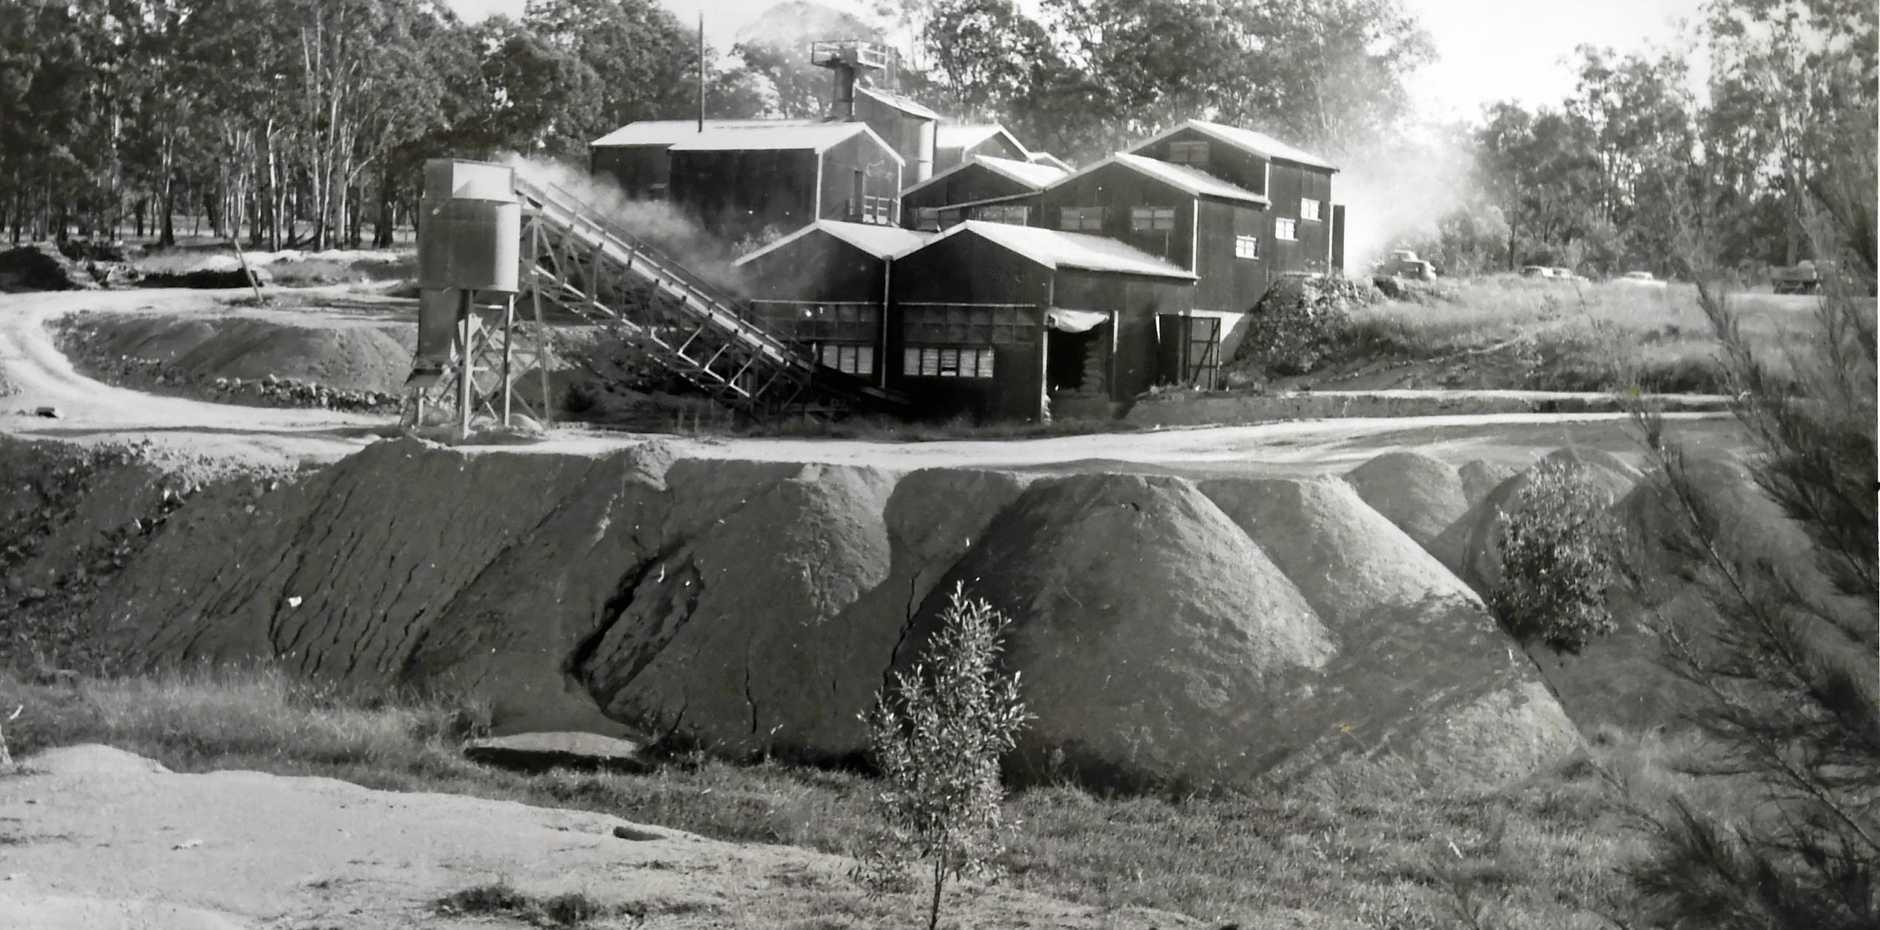 DANGER: Darcy McFadden's image of an asbestos mine in Baryulgil.